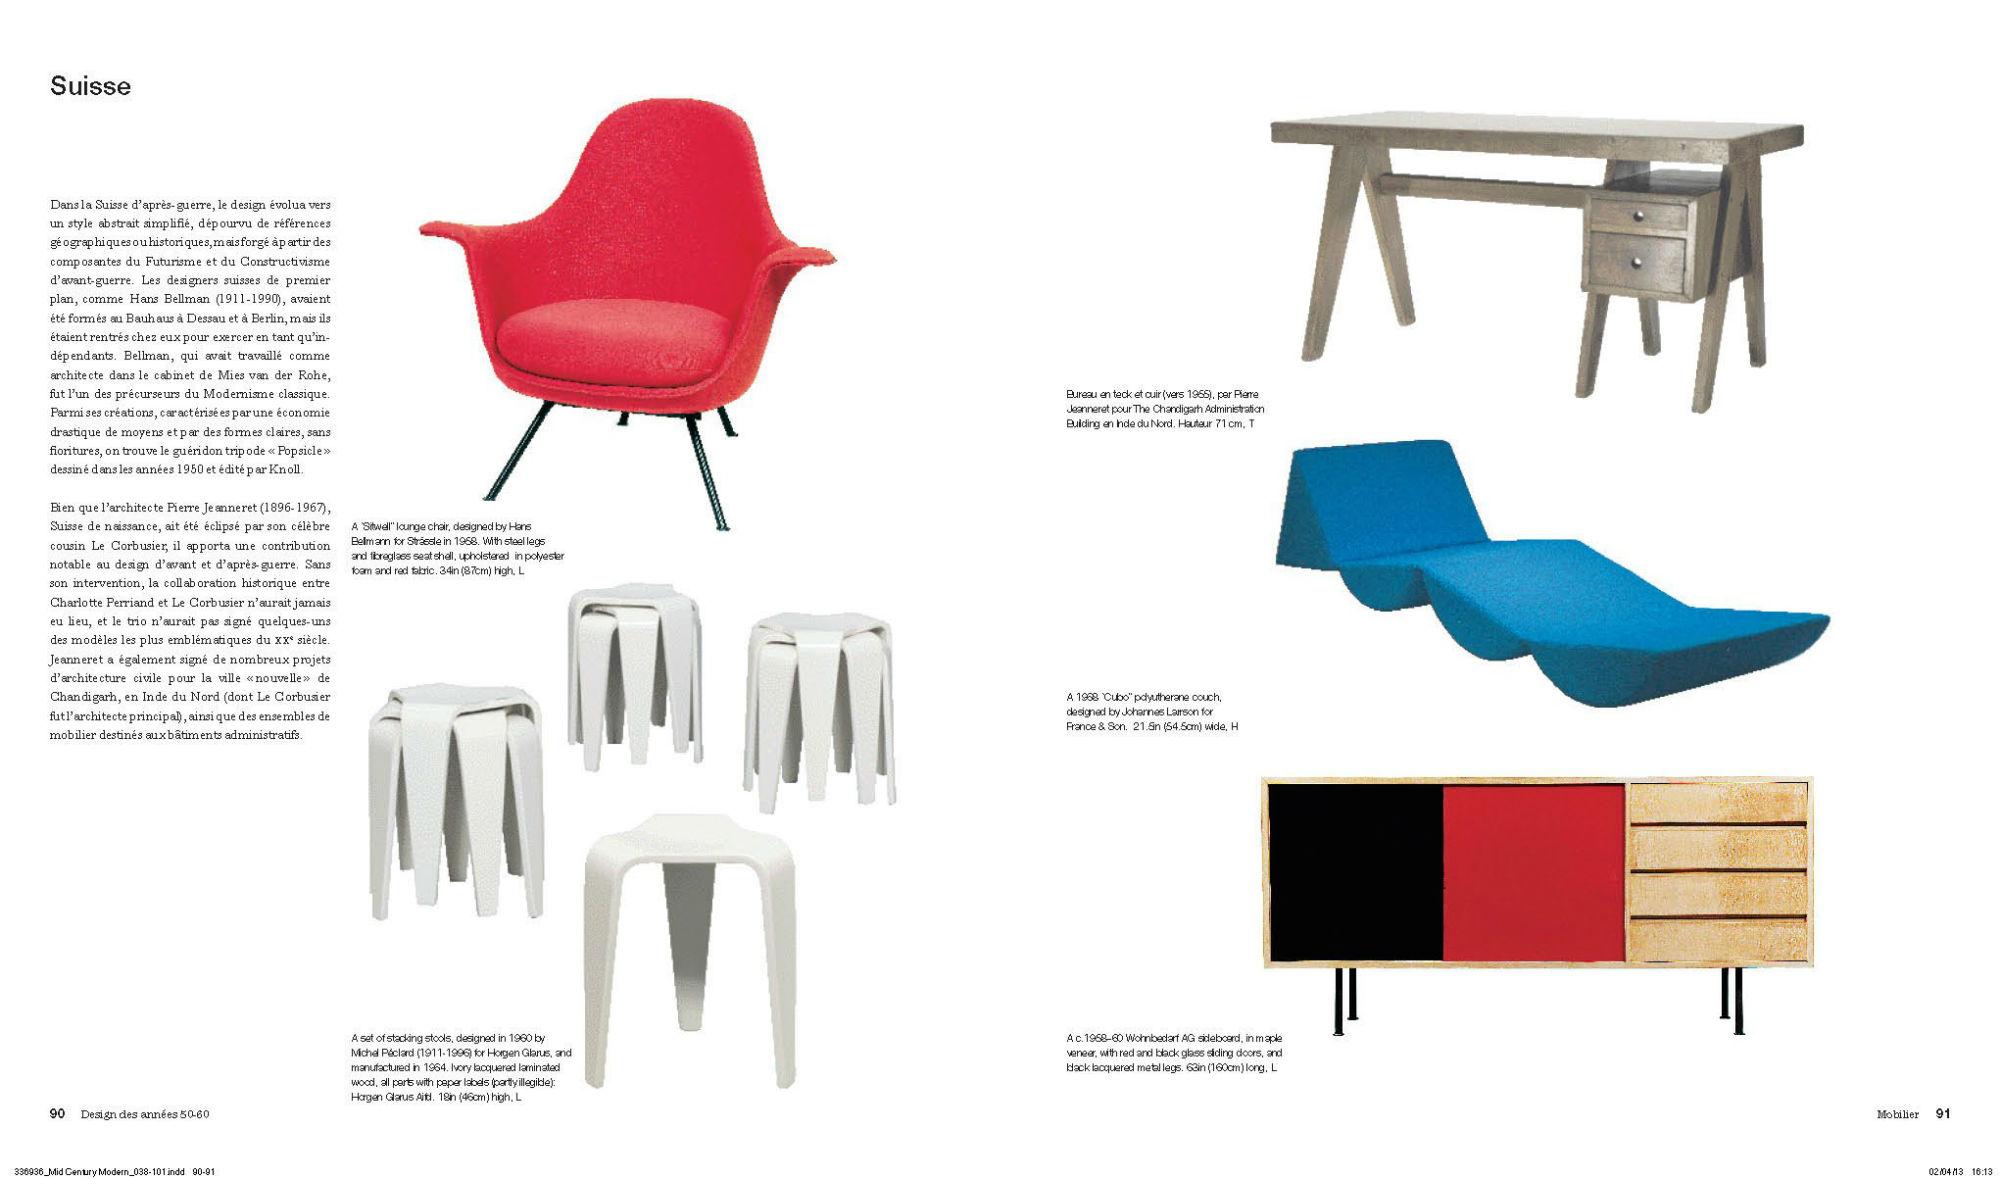 design des ann es 50 60 02 guten morgwen. Black Bedroom Furniture Sets. Home Design Ideas